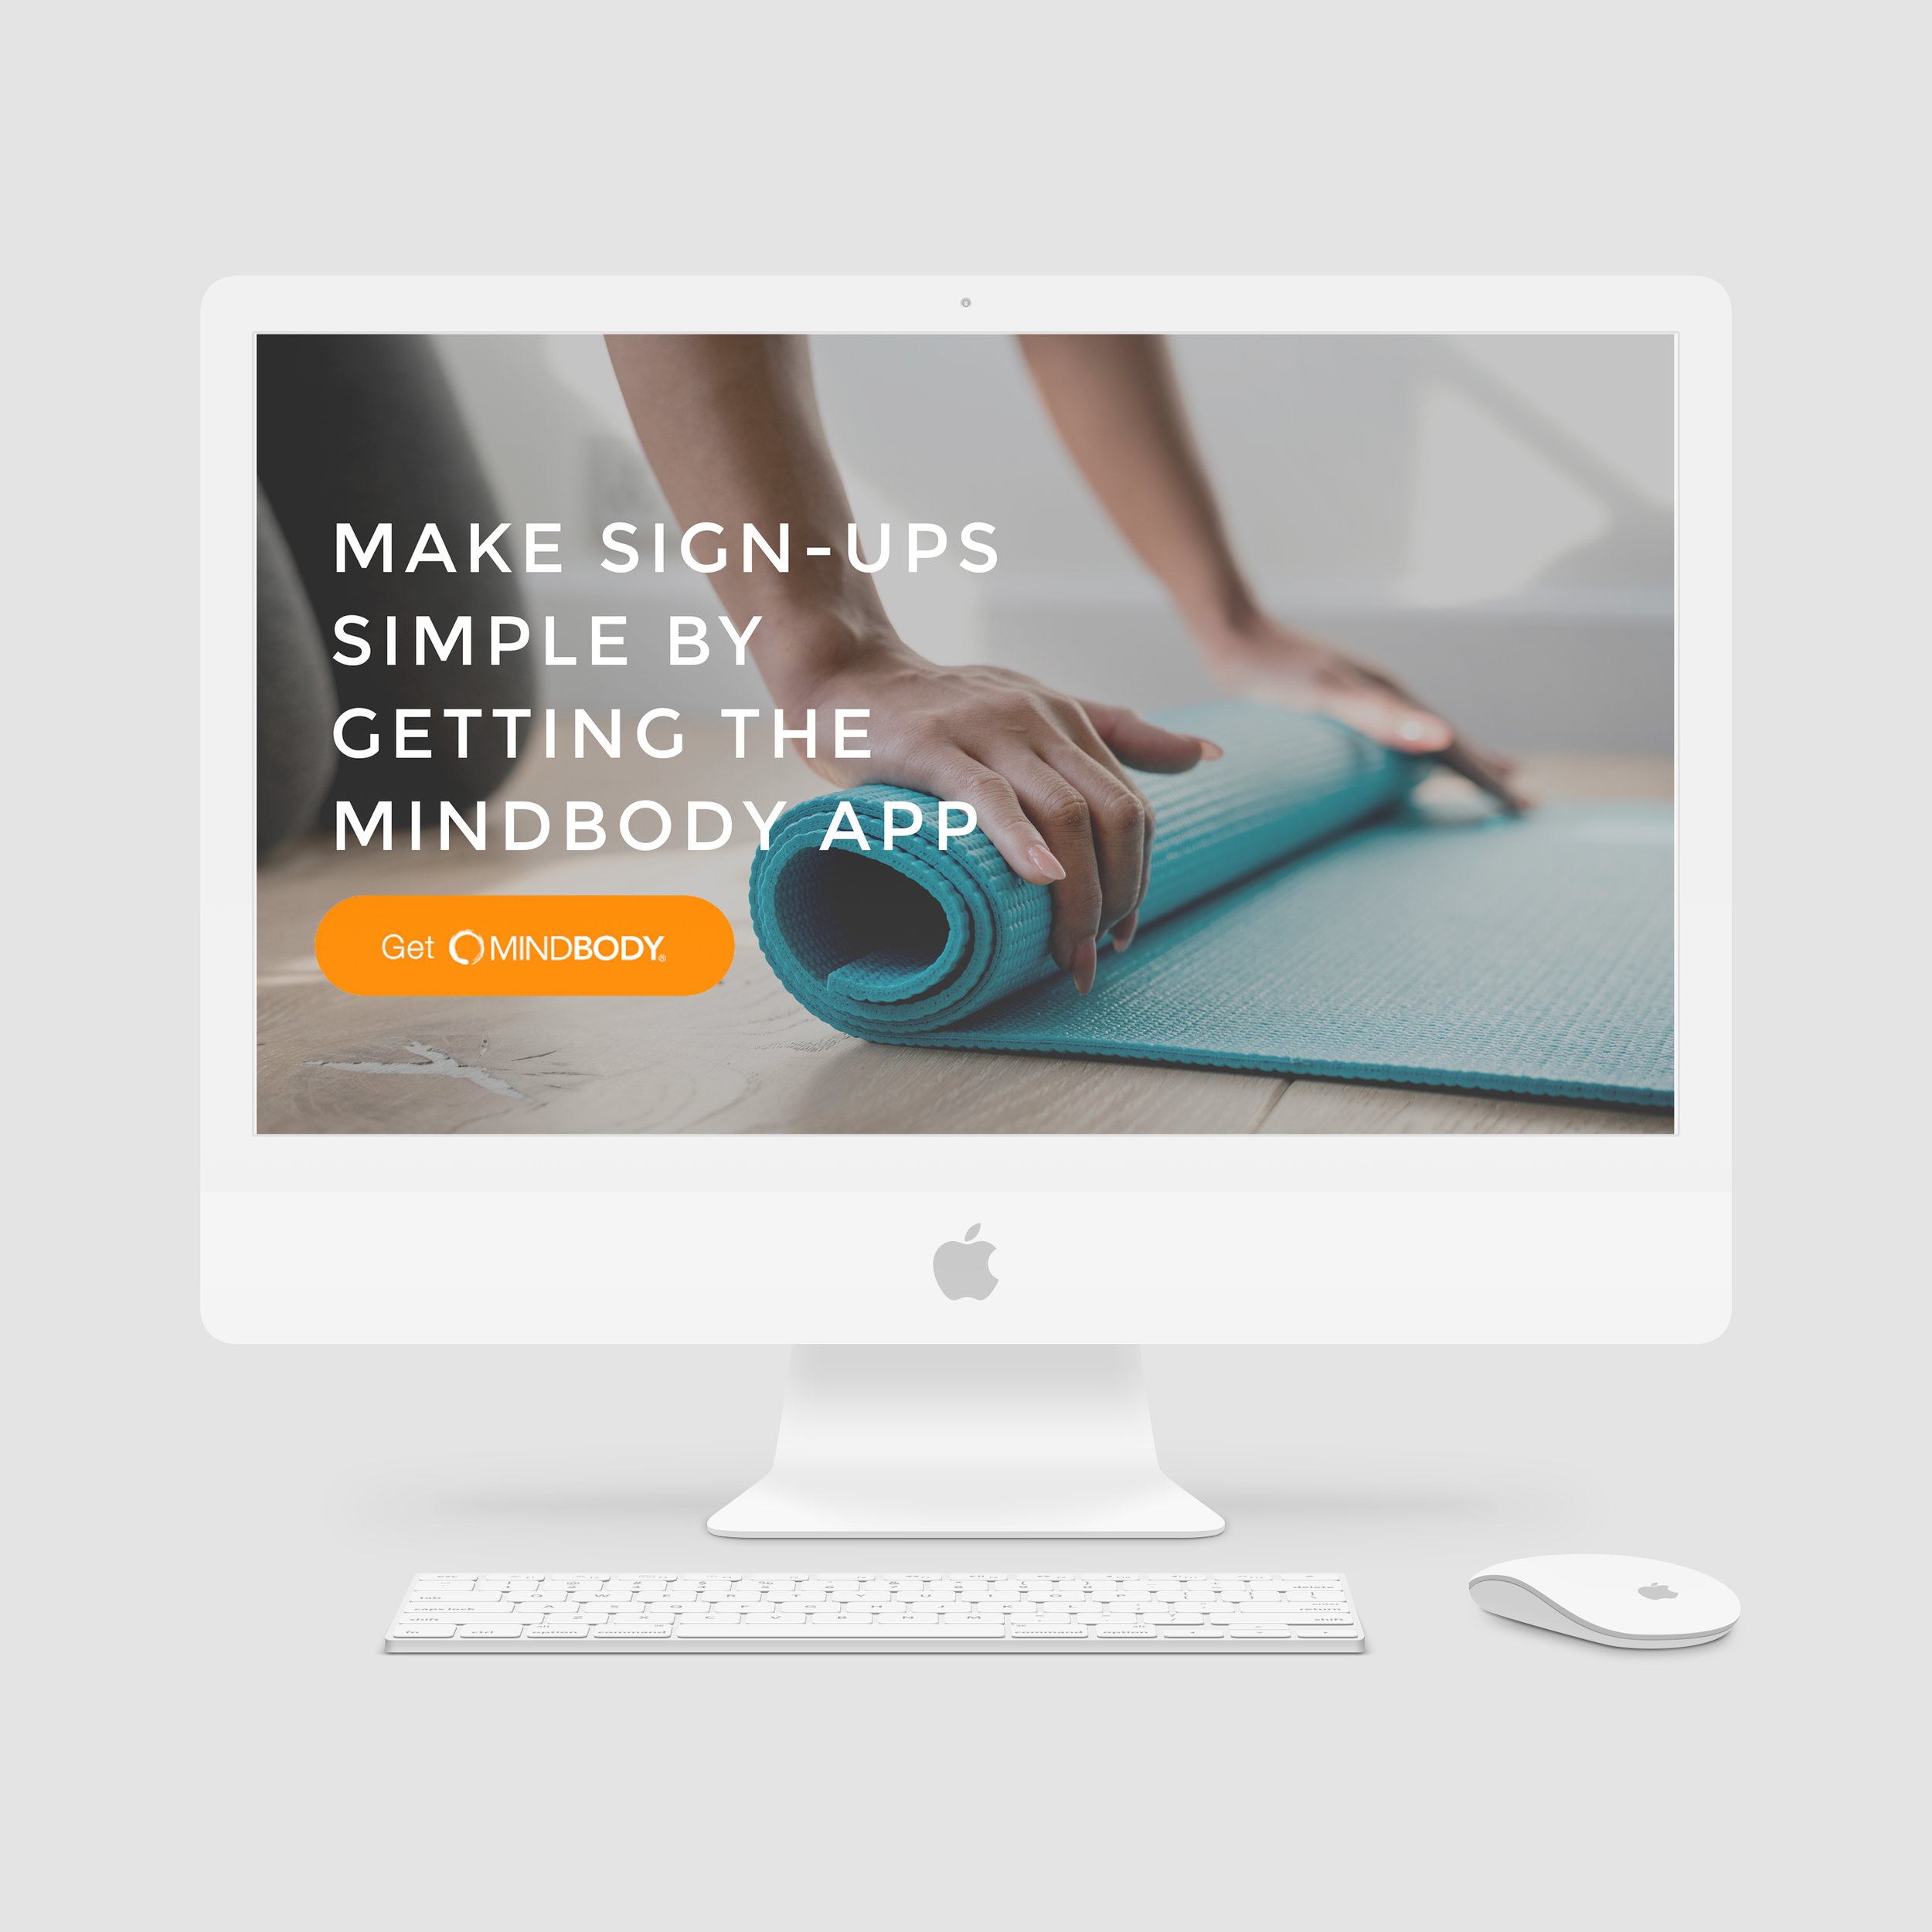 iMac-Clay-White-Frontal-Mockup (1).jpg